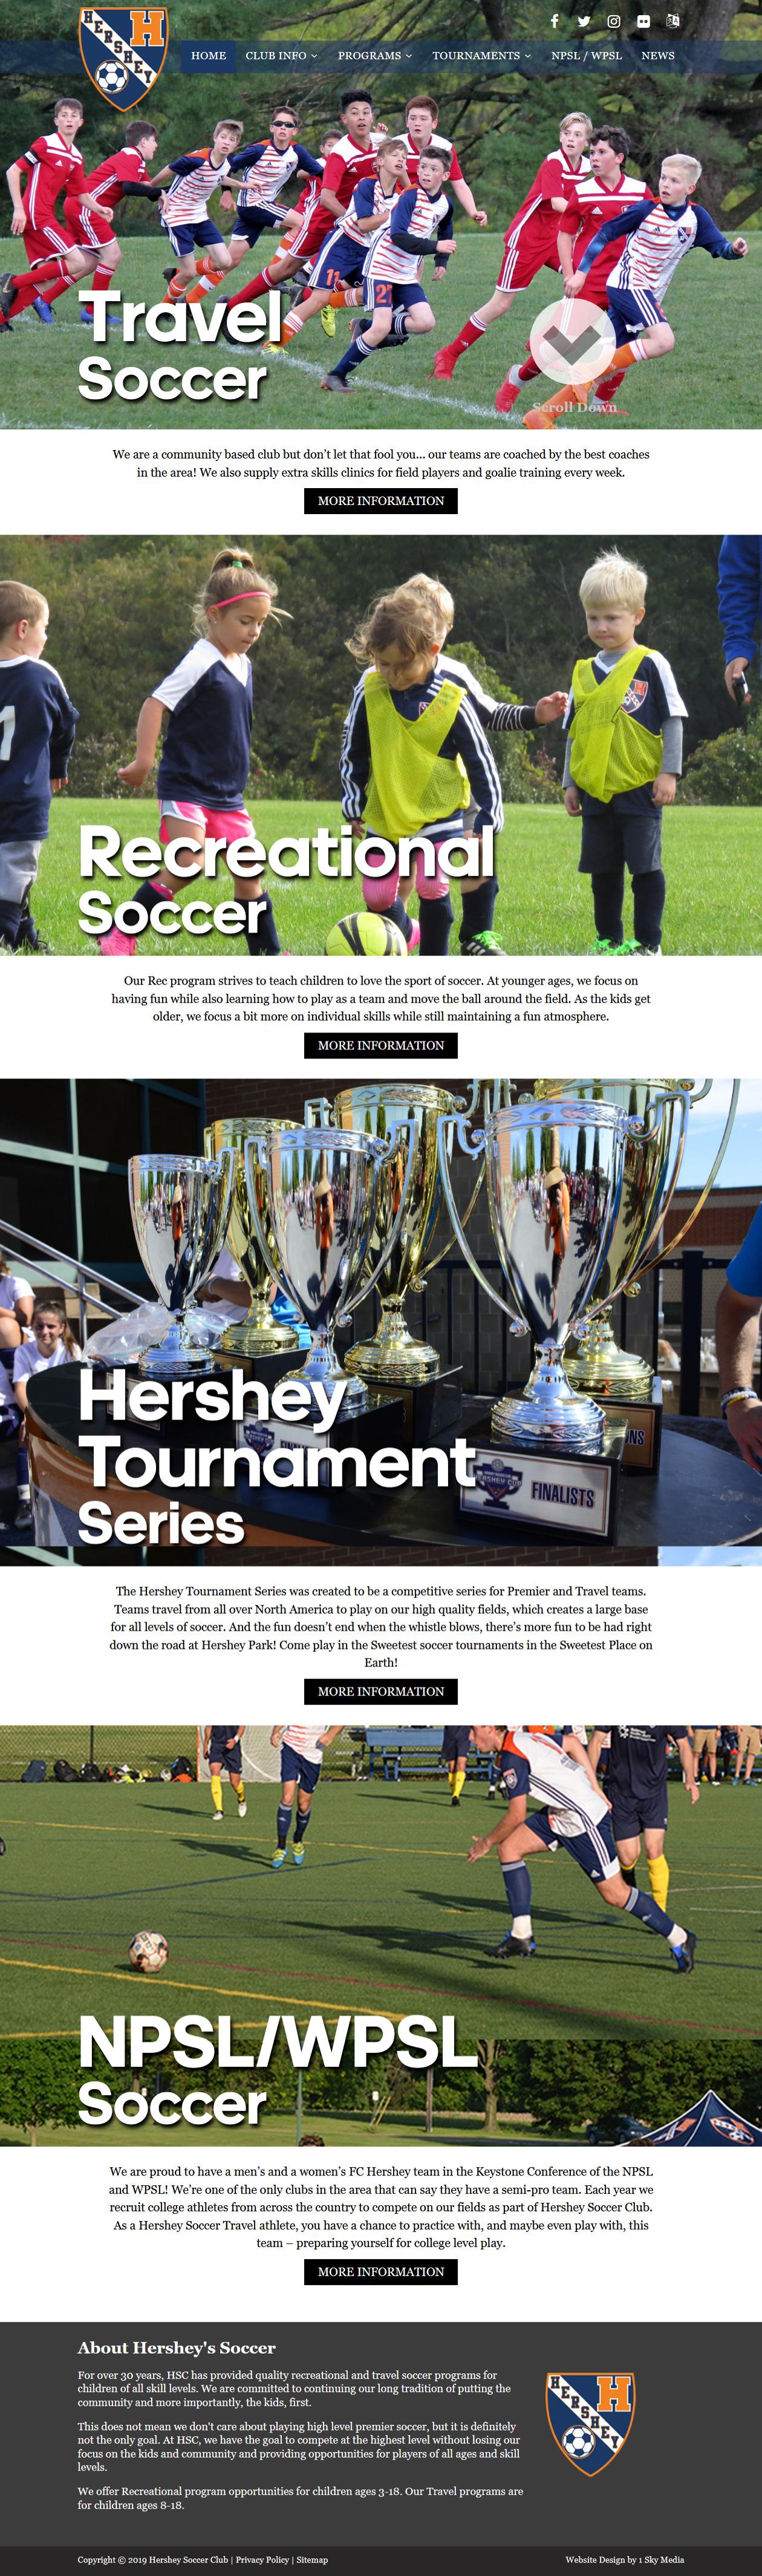 Hershey Soccer Club - soccer club website design